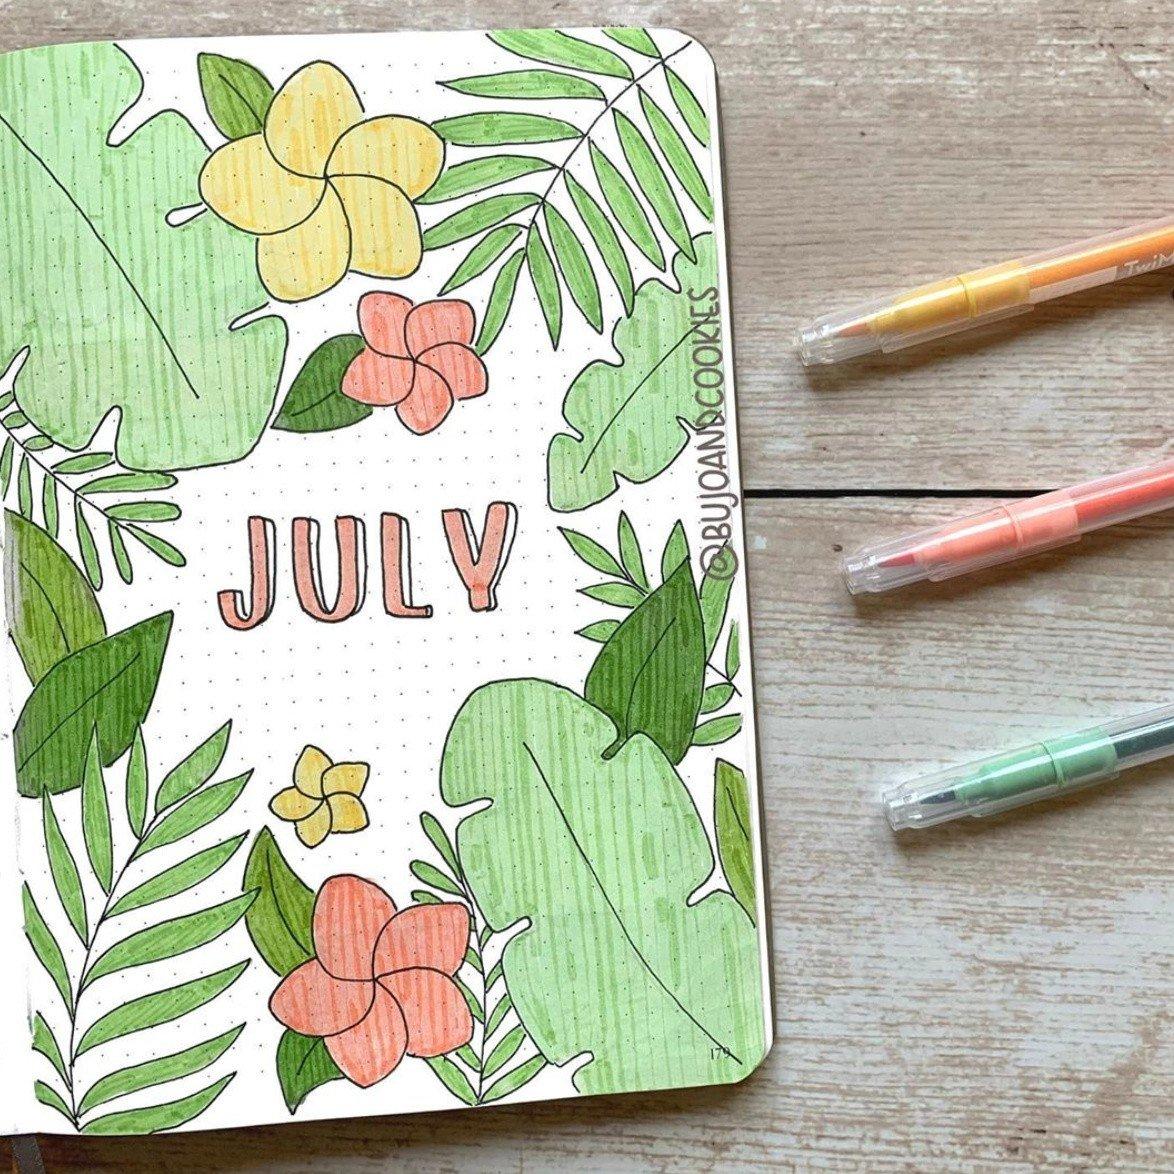 Best JULY Bullet Journal Ideas that You'll Love